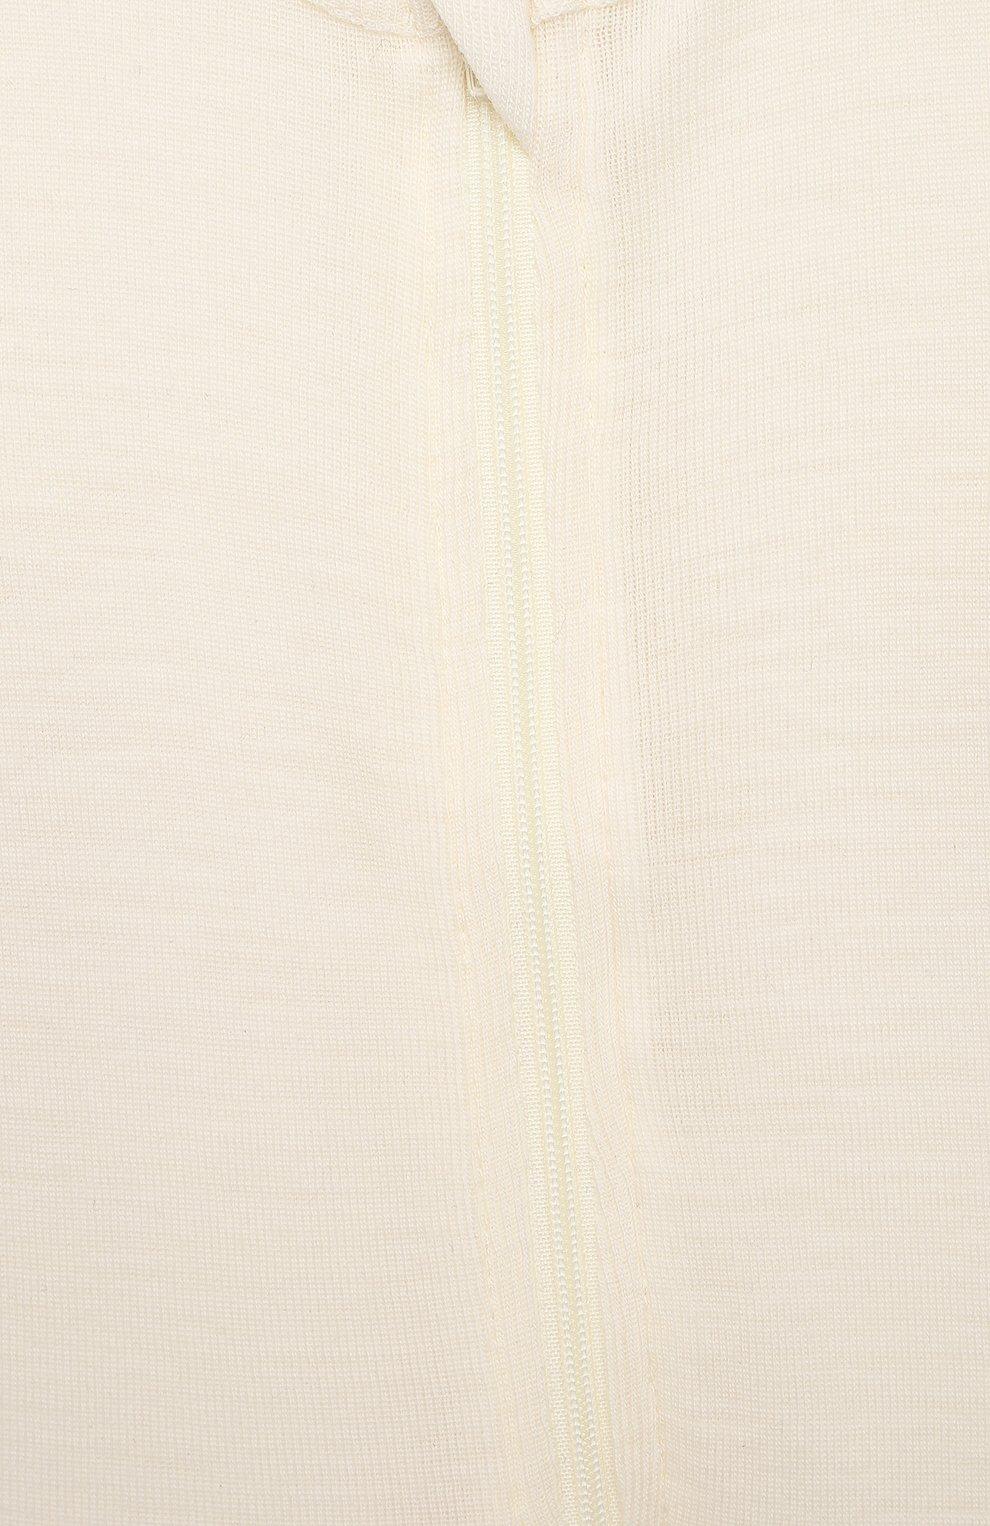 Детский комбинезон из шерсти и хлопка WOOL&COTTON бежевого цвета, арт. OMLRB | Фото 3